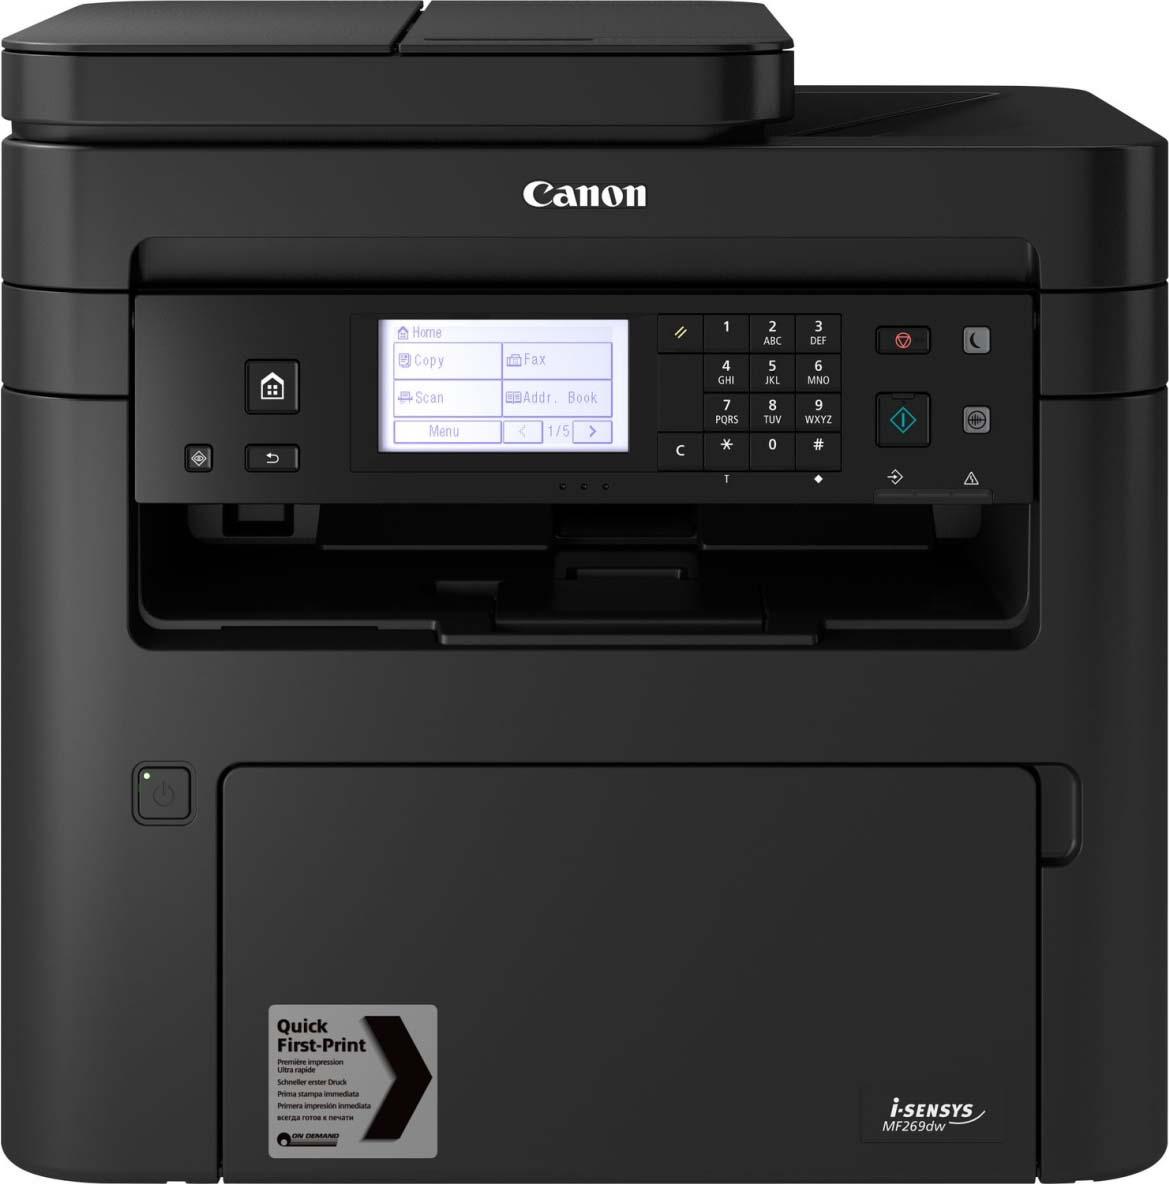 МФУ Canon i-SENSYS MF269dw, 670218, черный